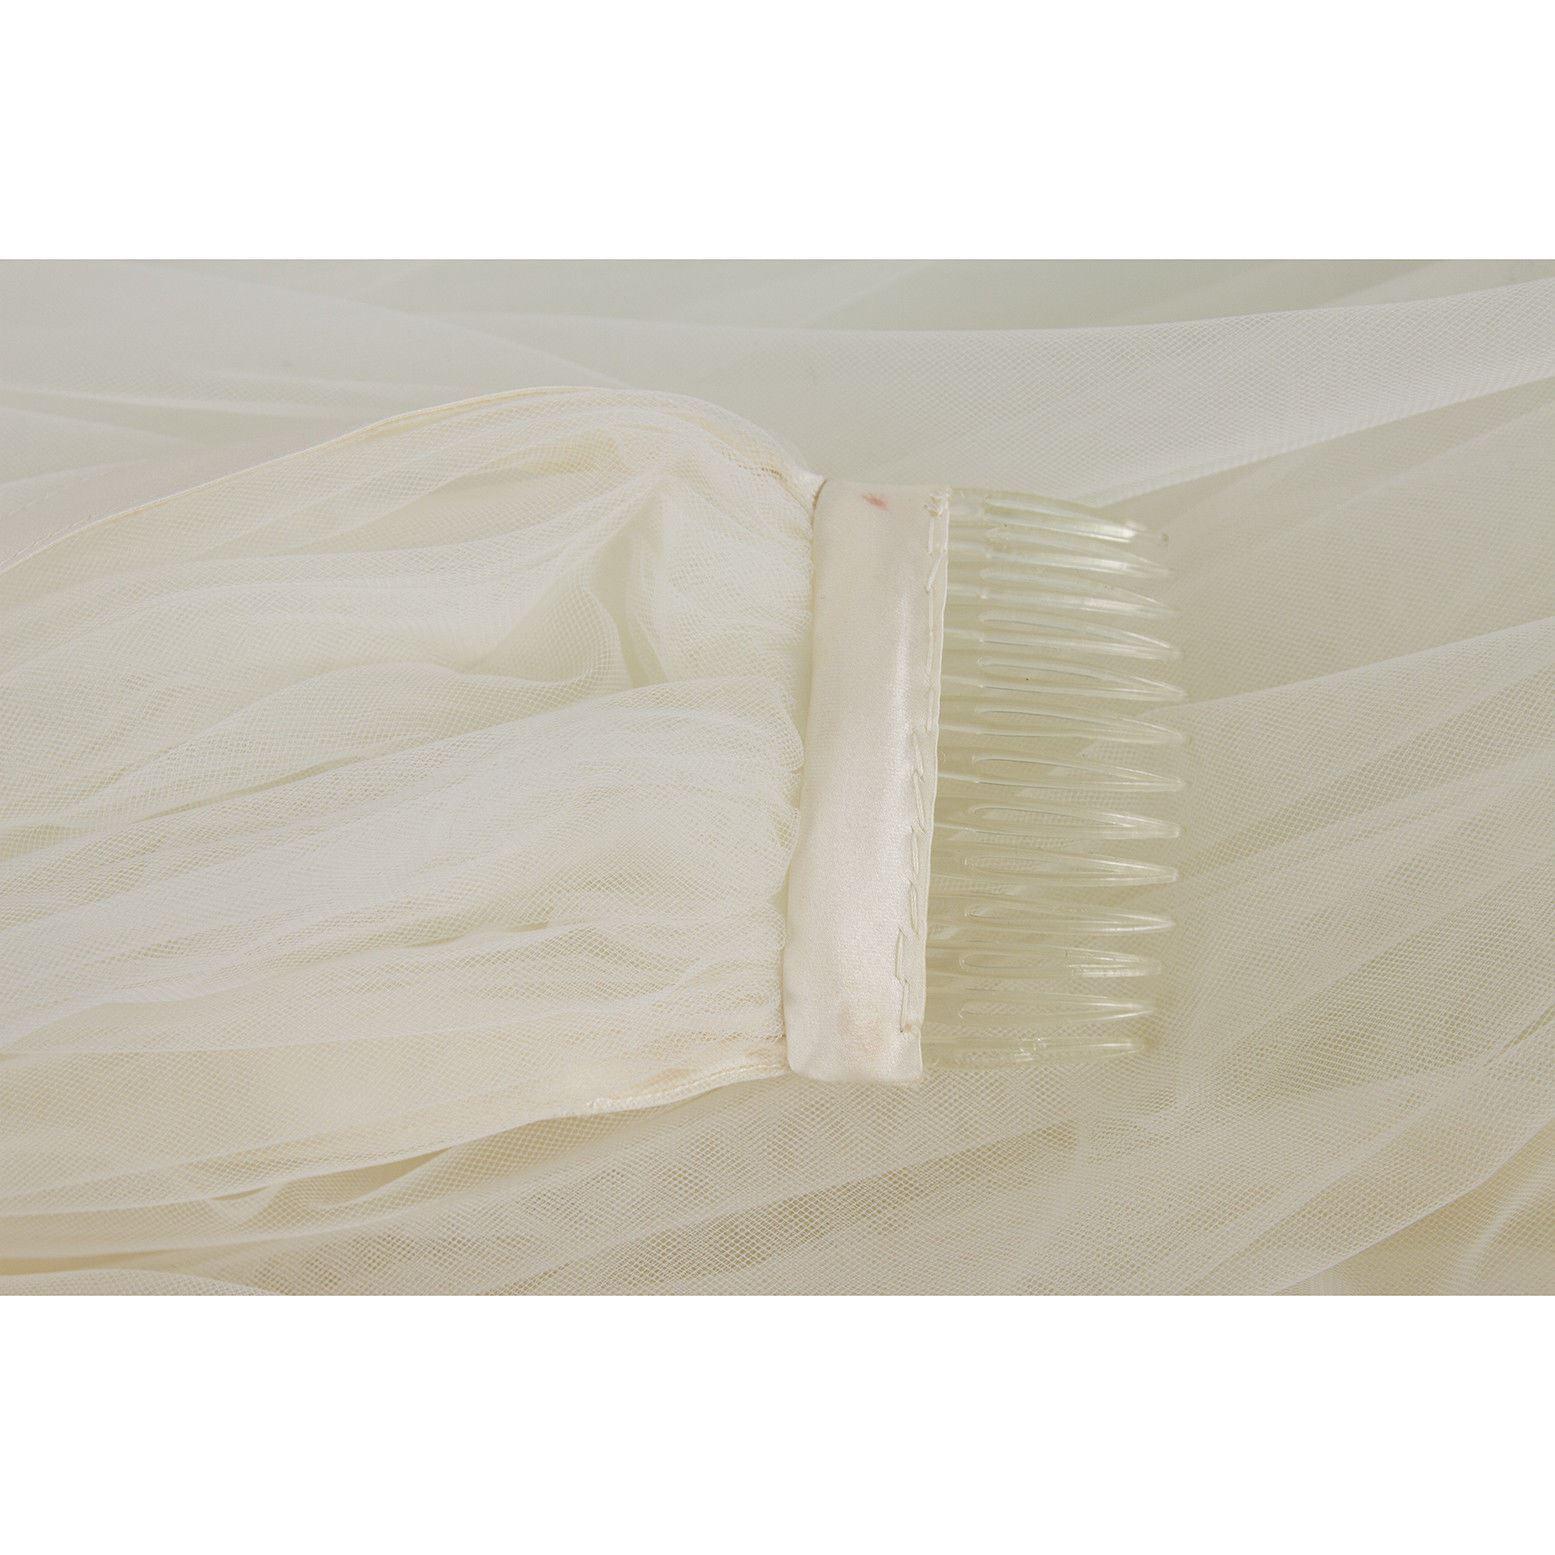 Vera Wang Silk Floor Length Bridal Wedding Gown Dress Strapless US 8 EU 42 image 10